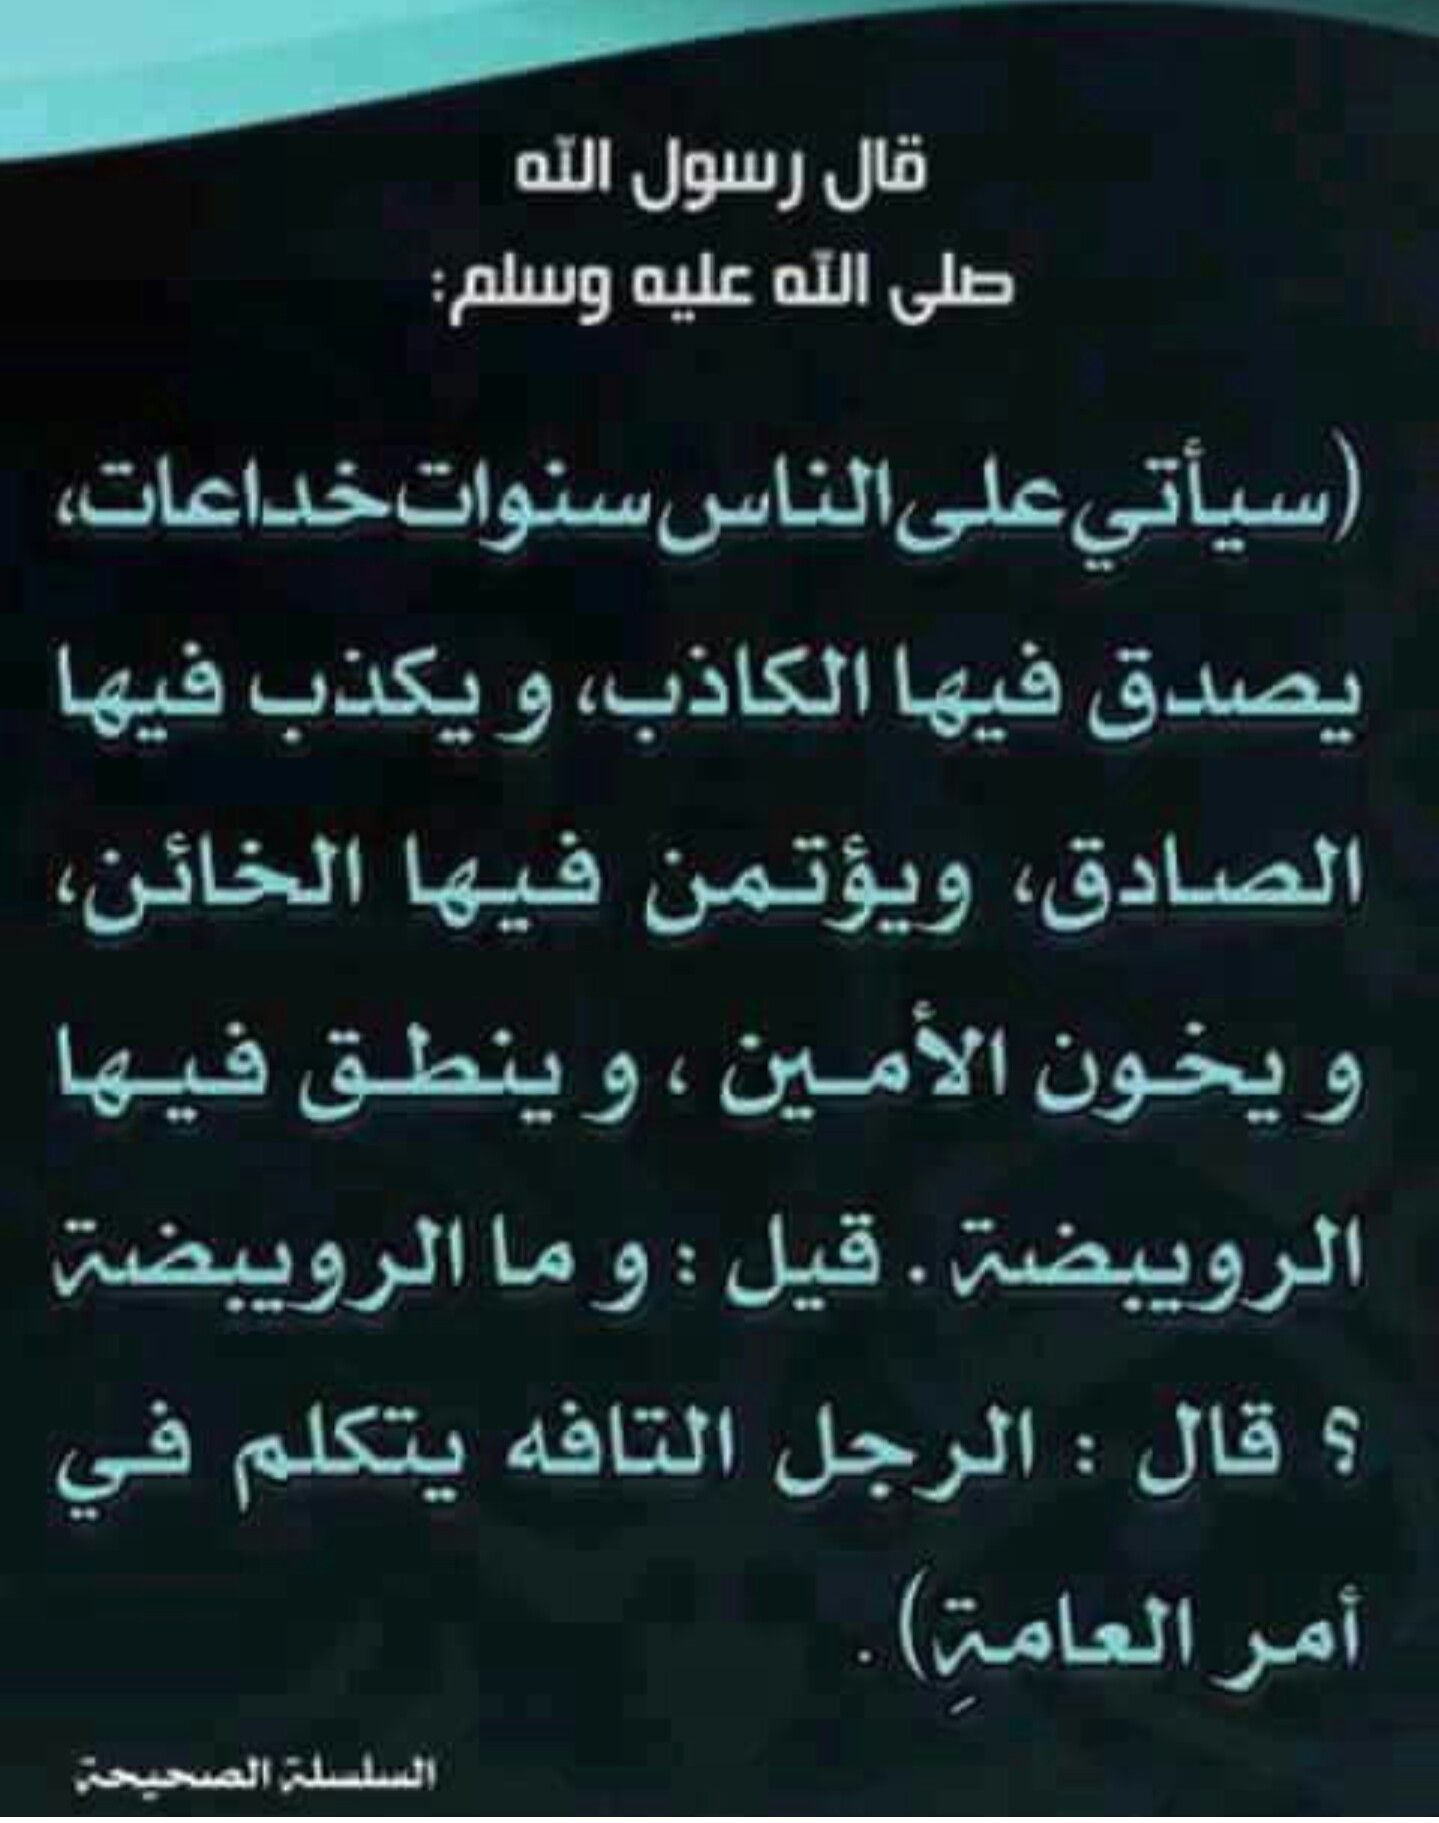 الرويبضة Quran Verses Verses Islamic Pictures